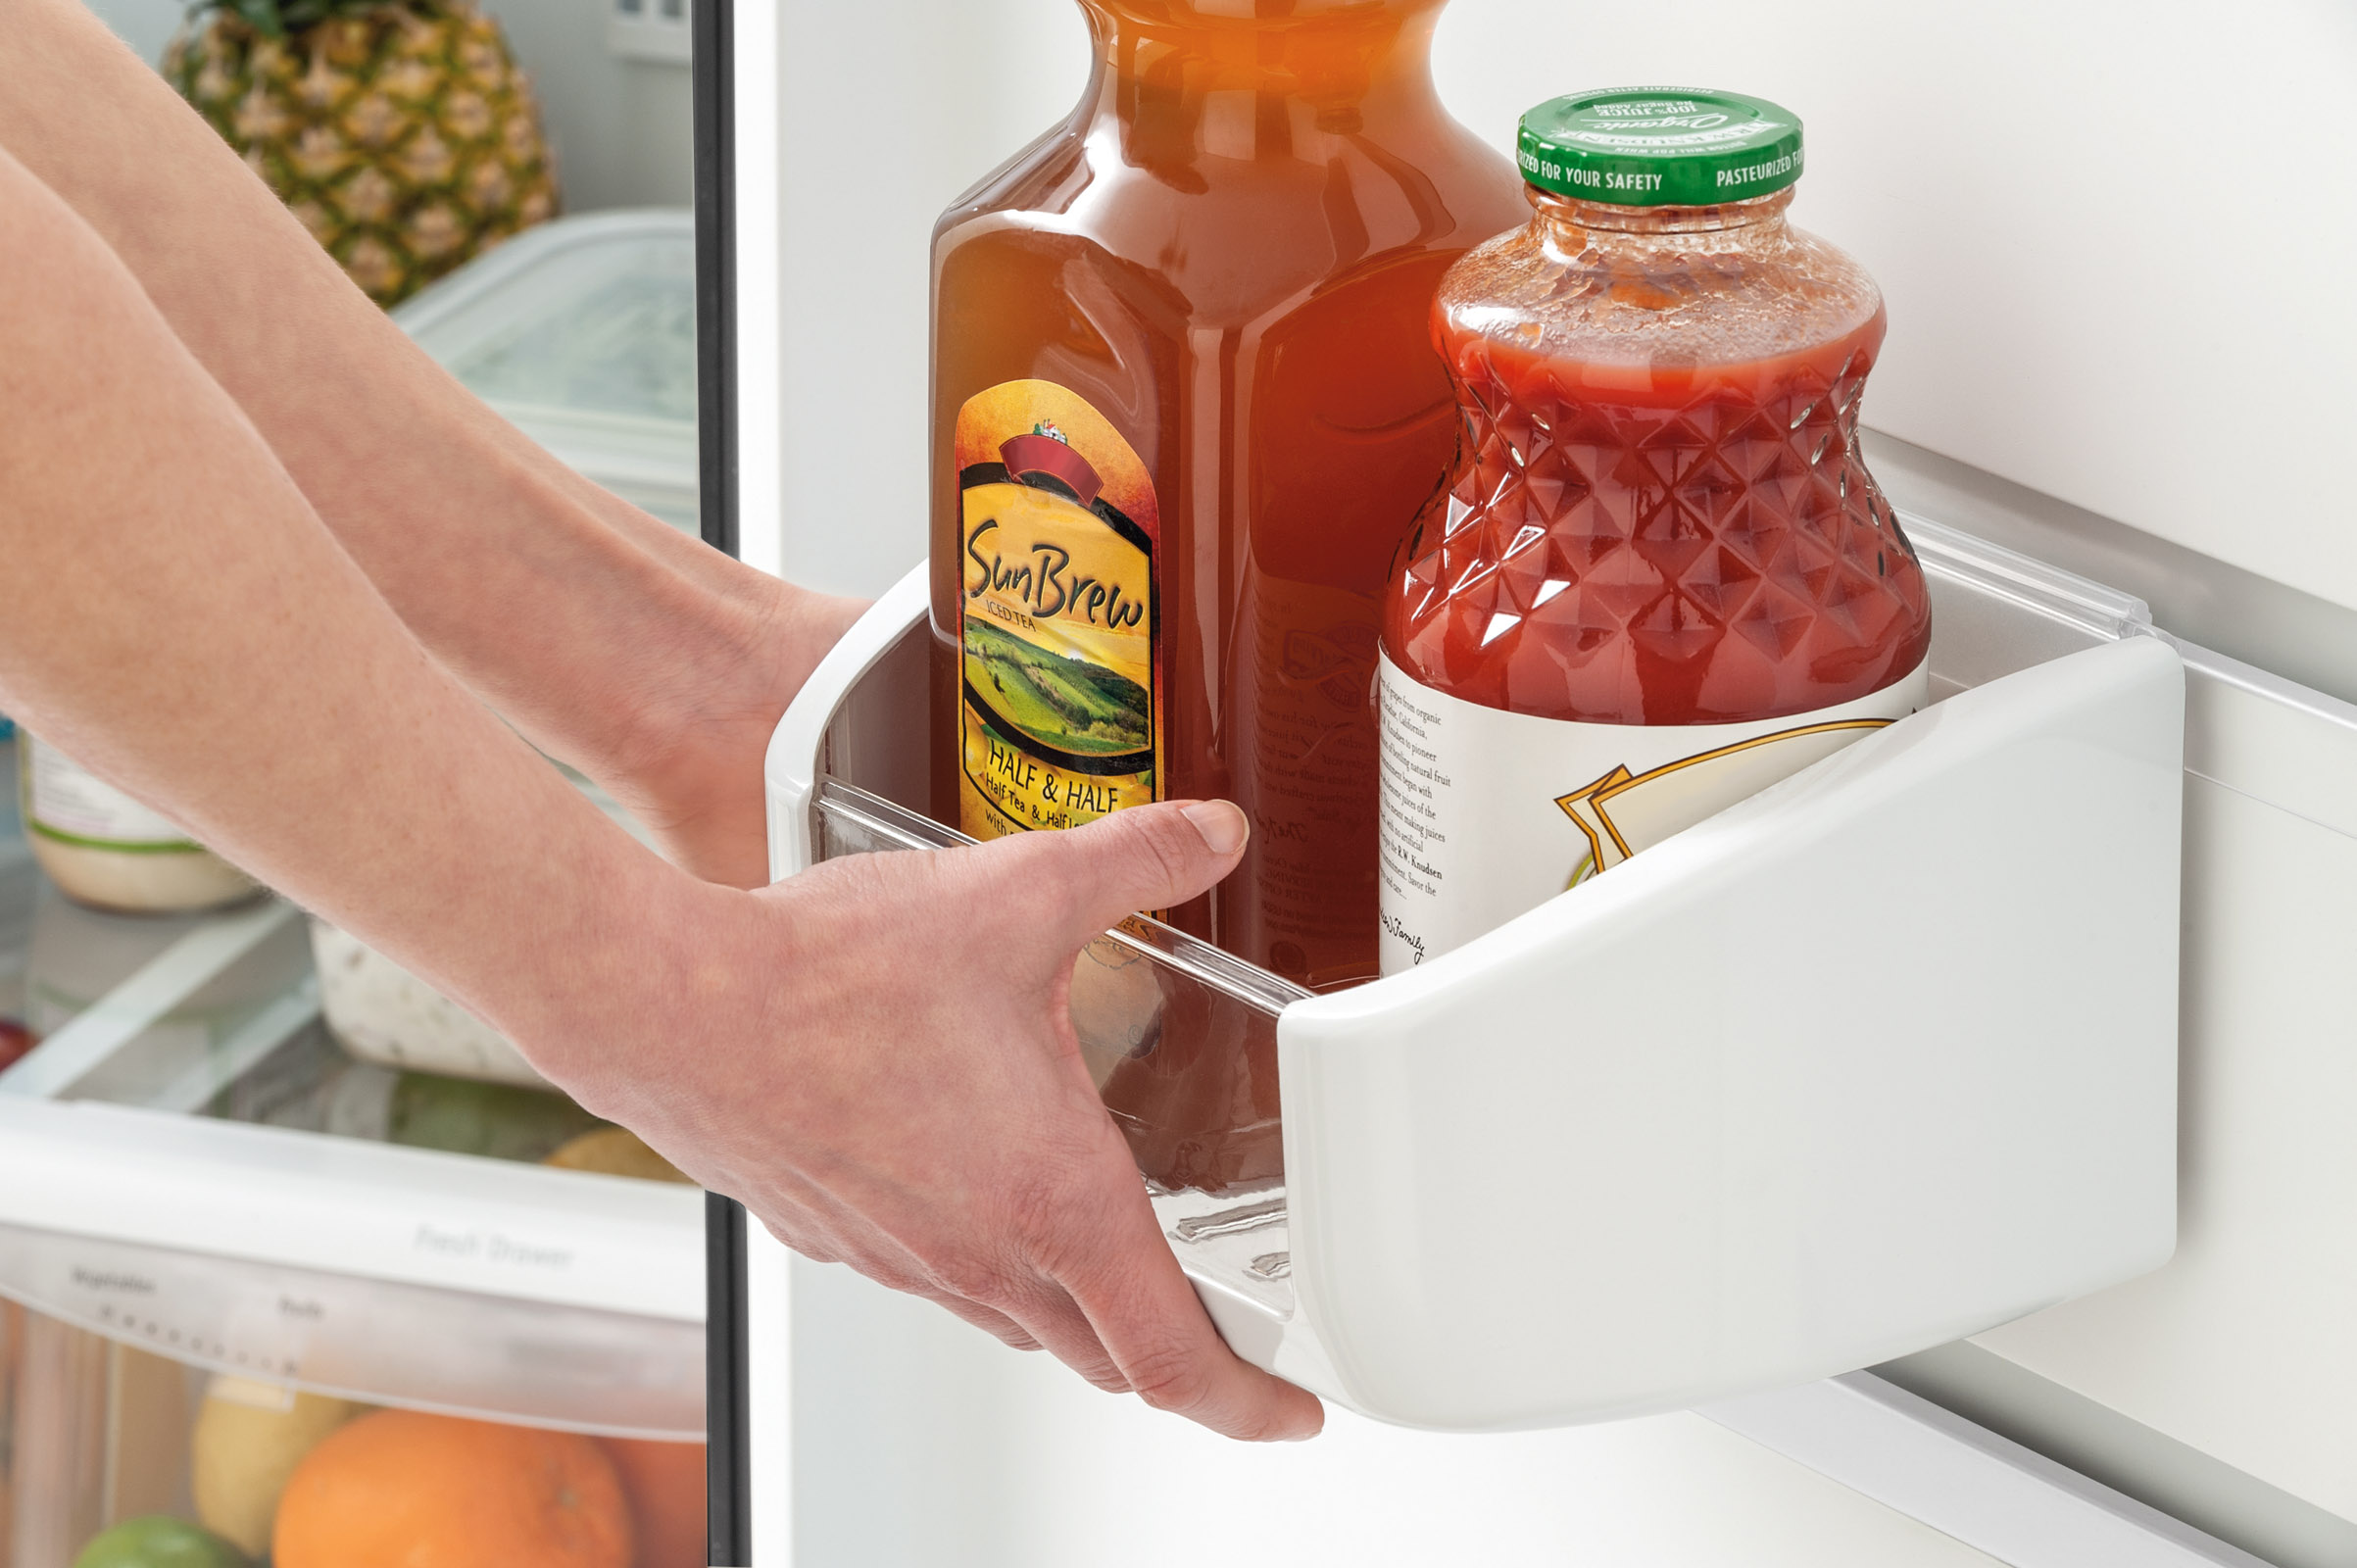 Kenmore 70629 20.4 cu. ft. Top Freezer Refrigerator - Black